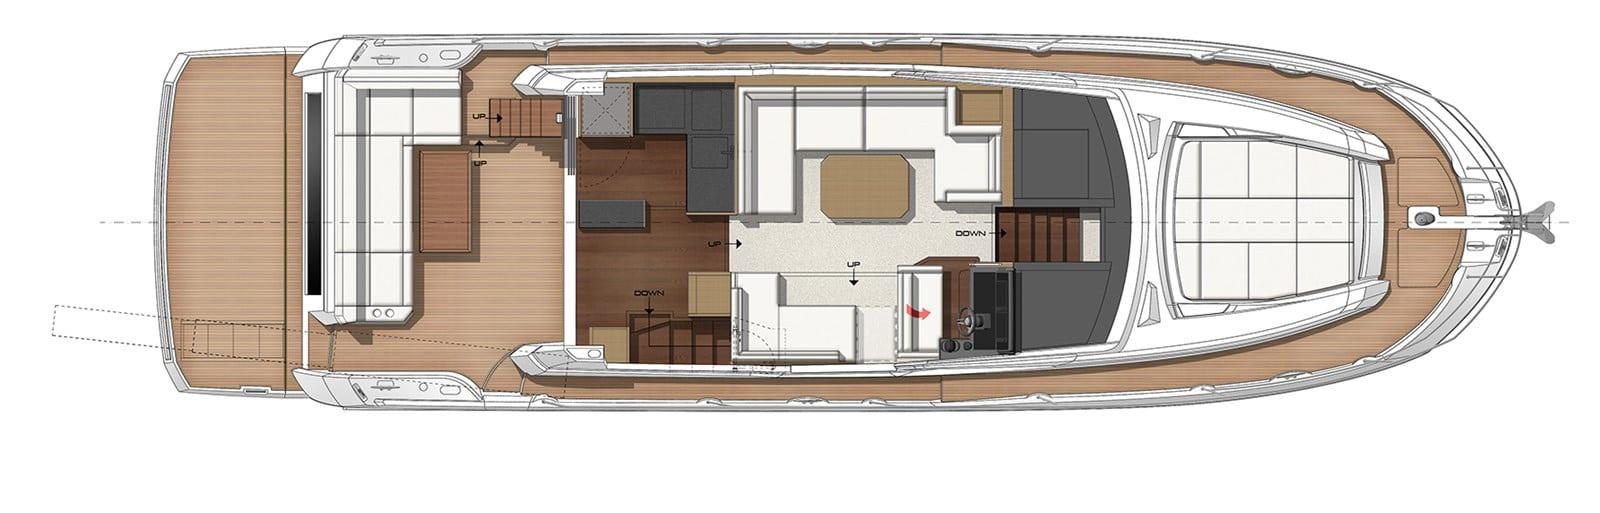 prestige yacht 520s yacht layout (1)